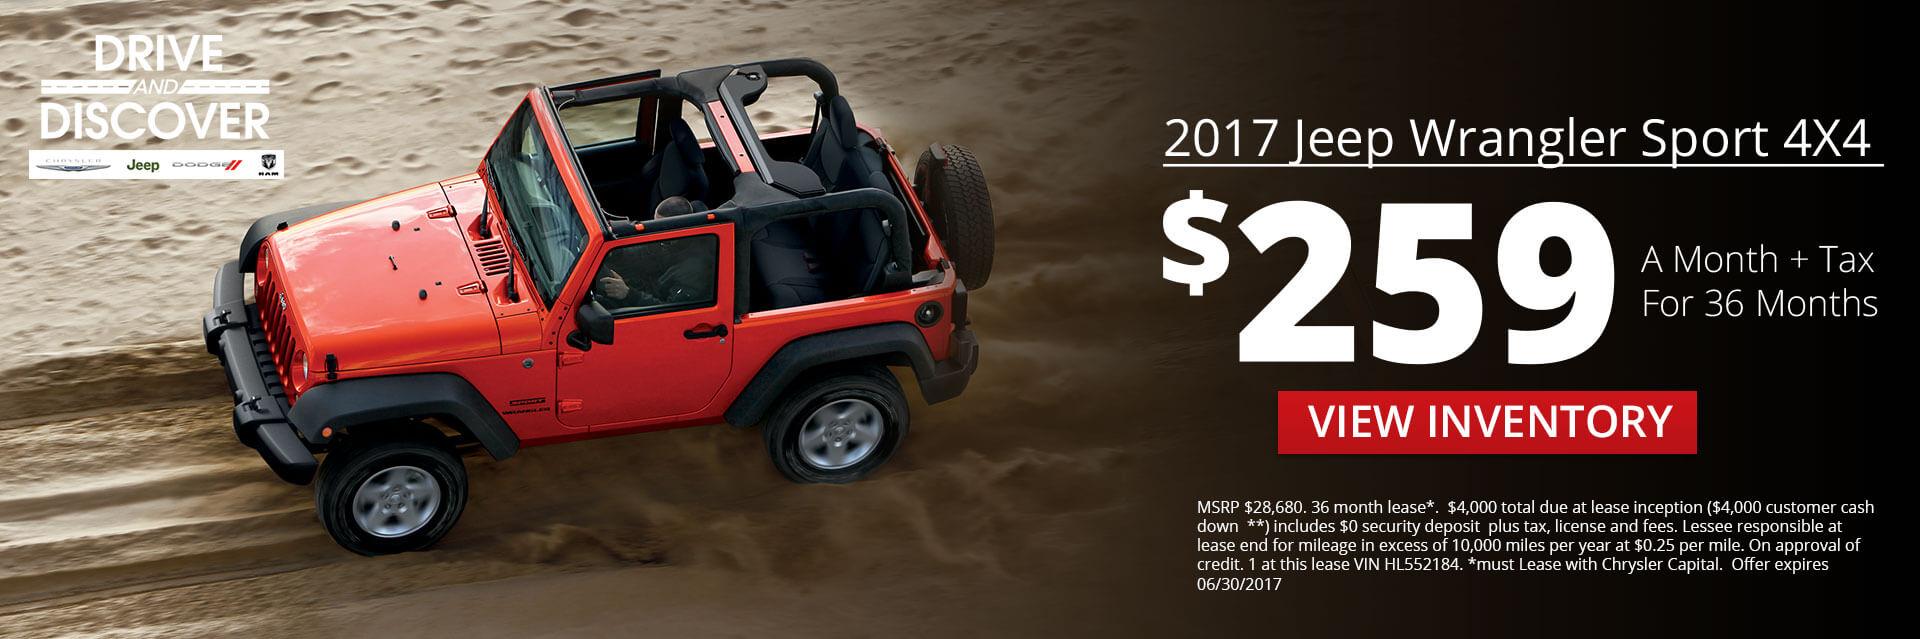 2017 Jeep Wrangler HP